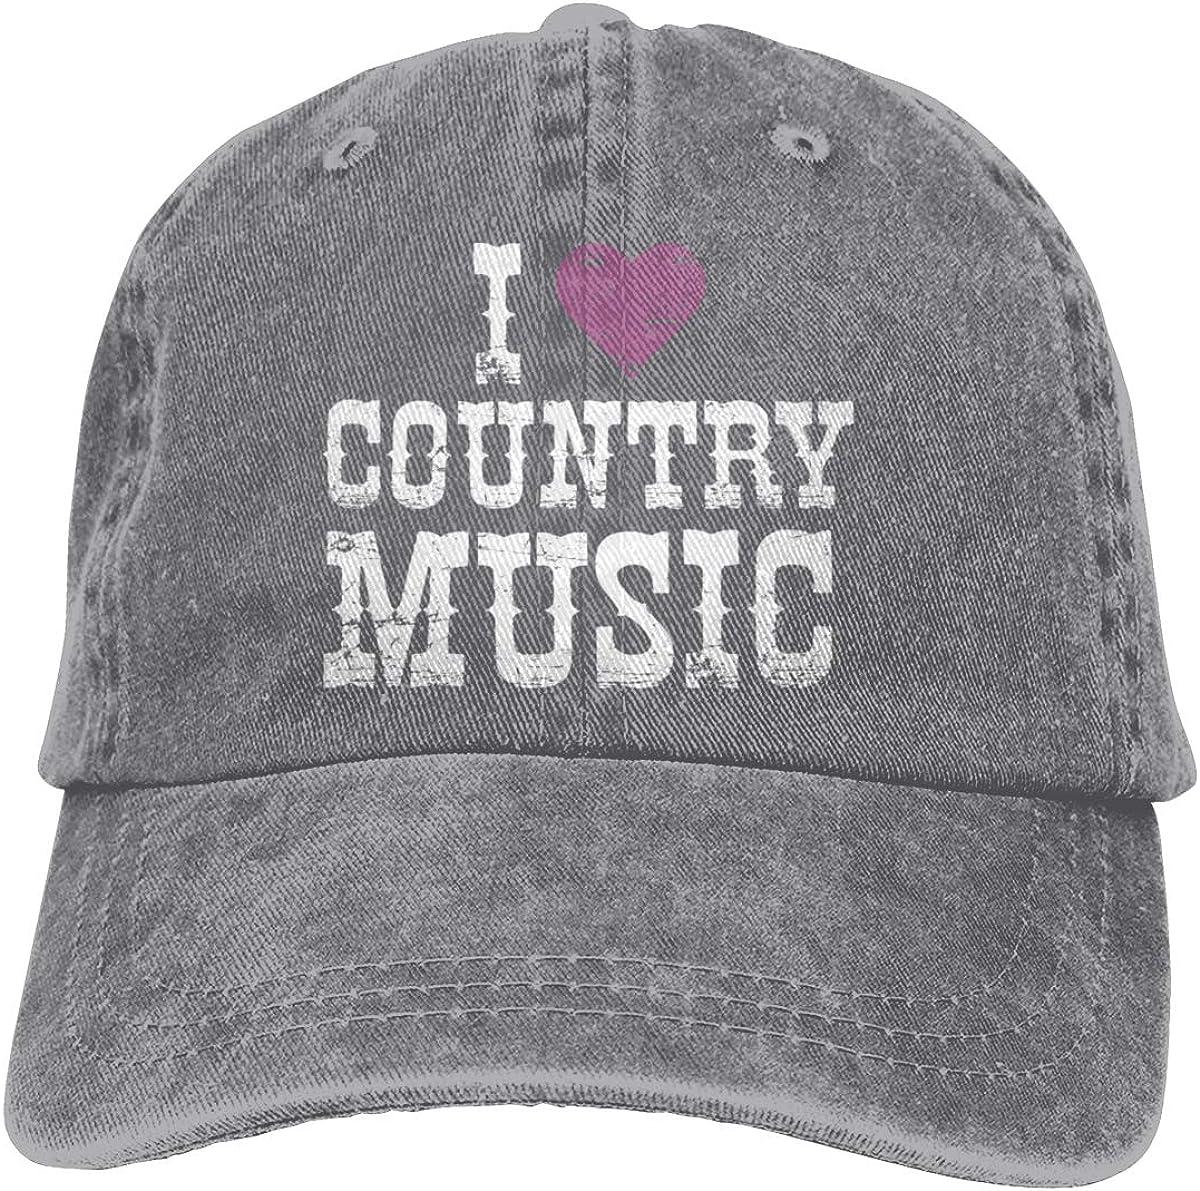 Fashion Vintage Hat Im Huge in Ireland Adjustable Dad Hat Baseball Cowboy Cap